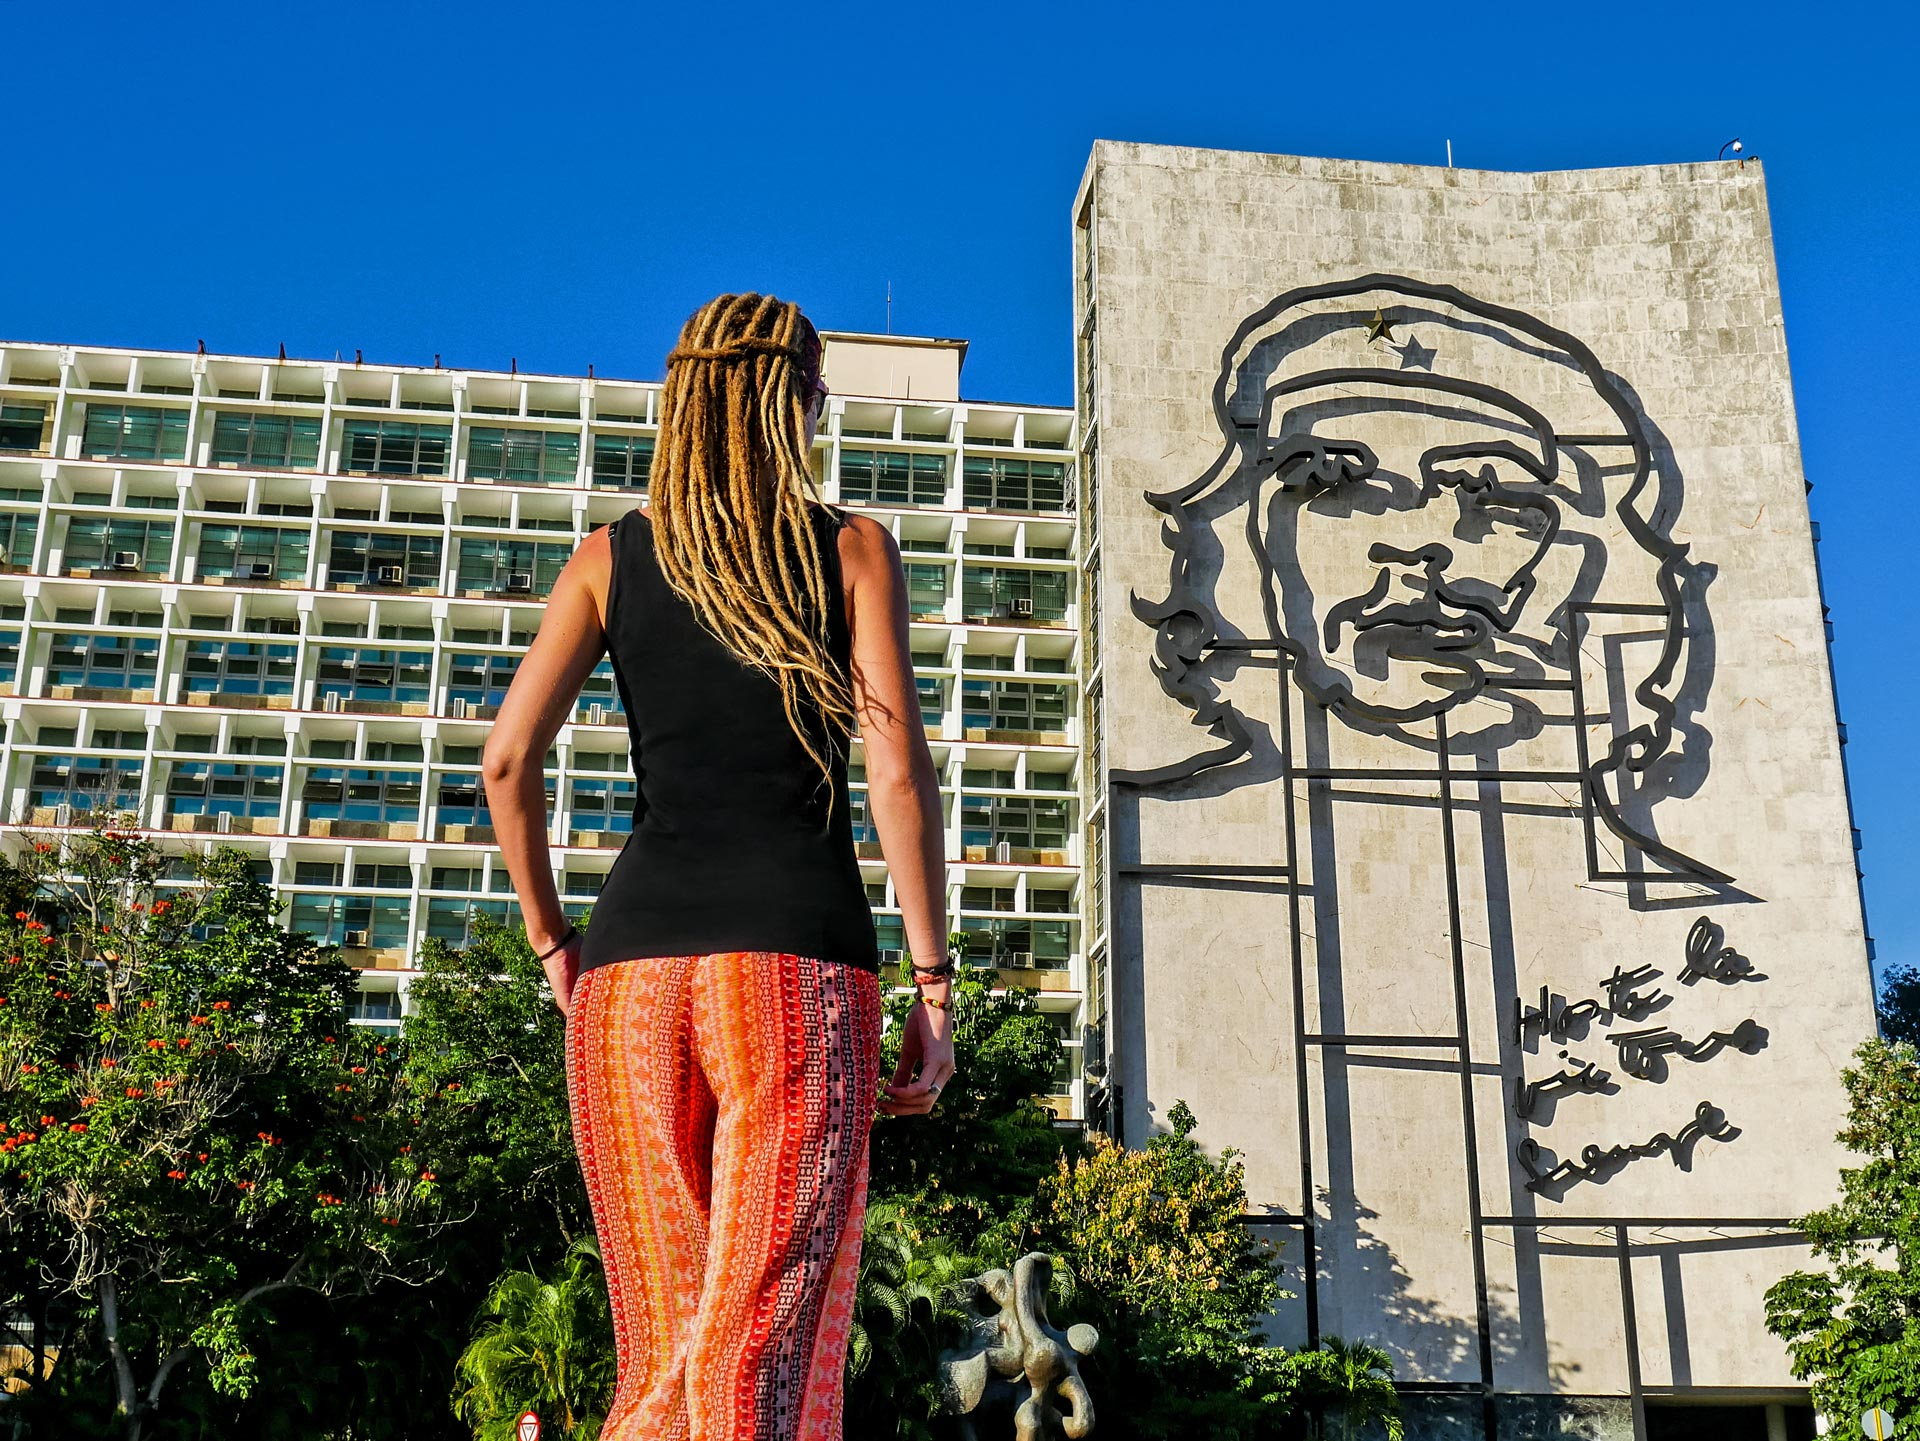 Rasta girl at Plaza de la Revolucion in Havana, Cuba, looking at Che Guevara memorial